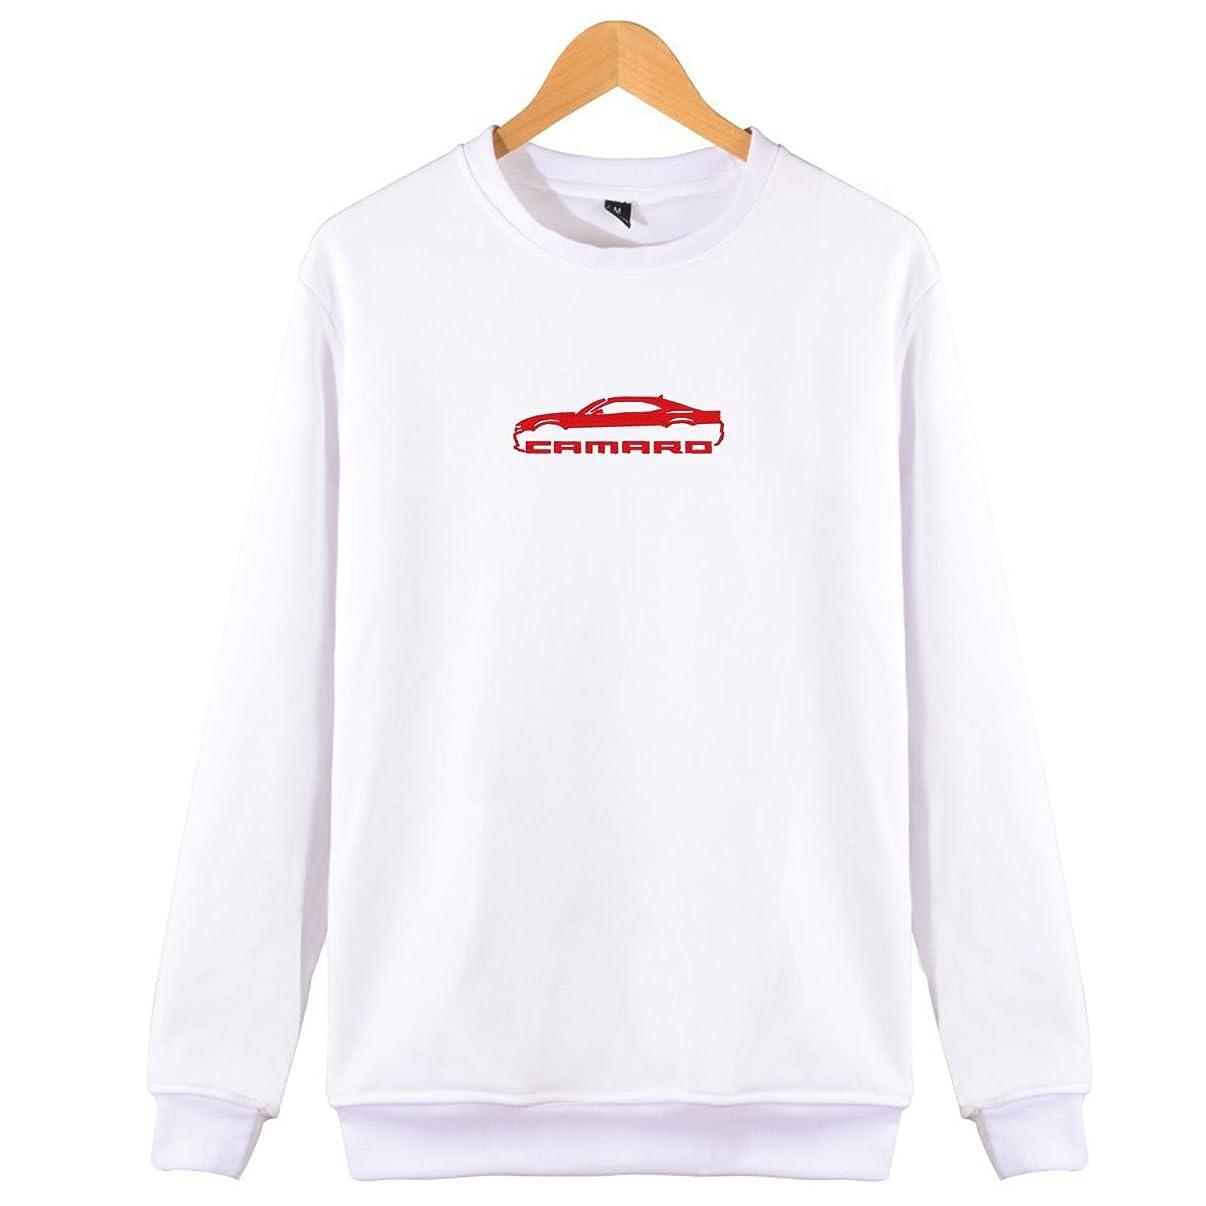 Maggie Duncan Sweatshirt Zip Up T-Shirt Jersey Hoodie Soft Datsun 260z Hooded Unisex